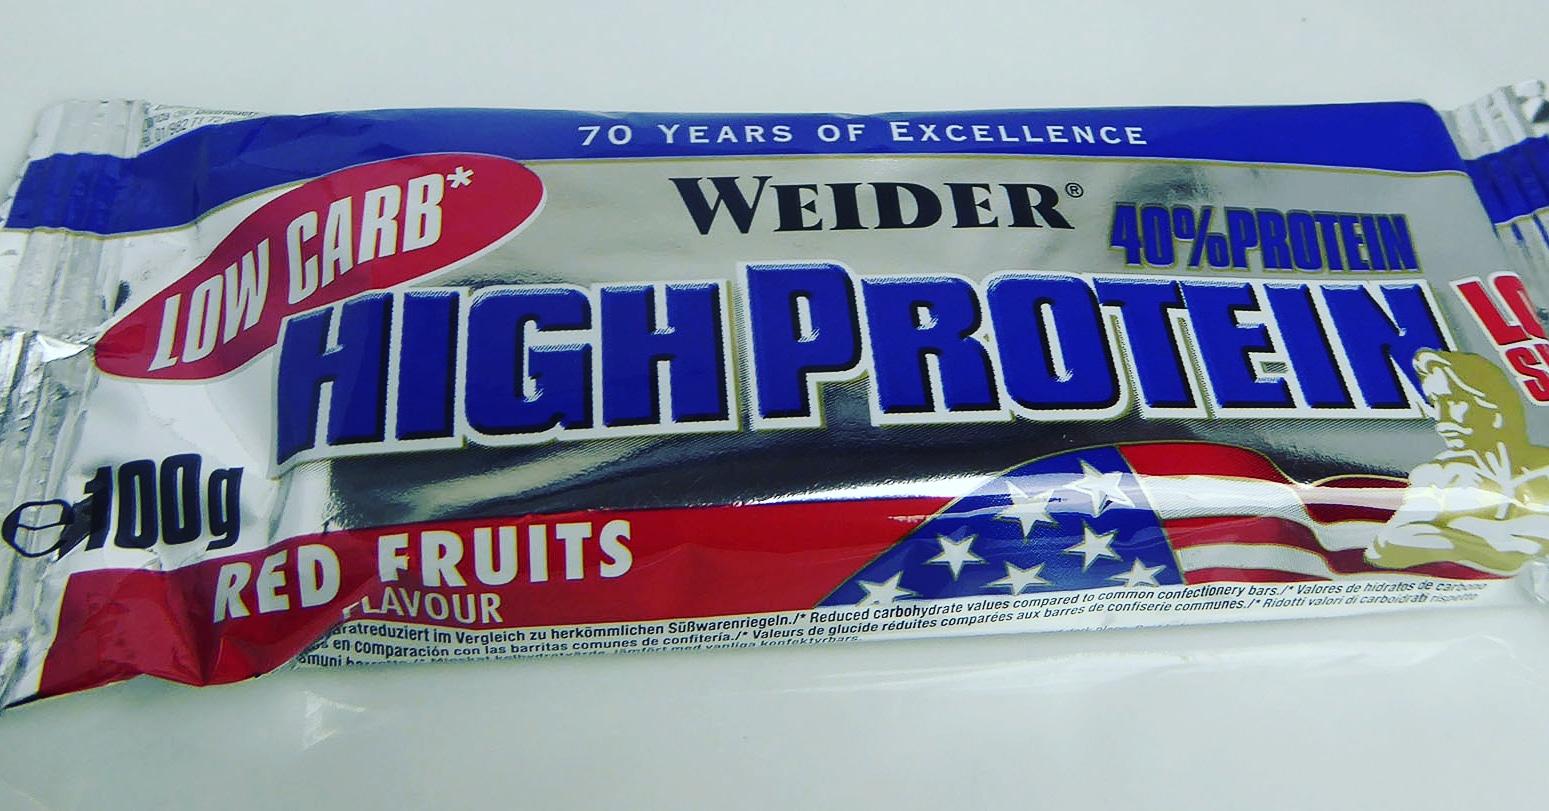 Weider High Protein Bar Low Sugar Red Fruits